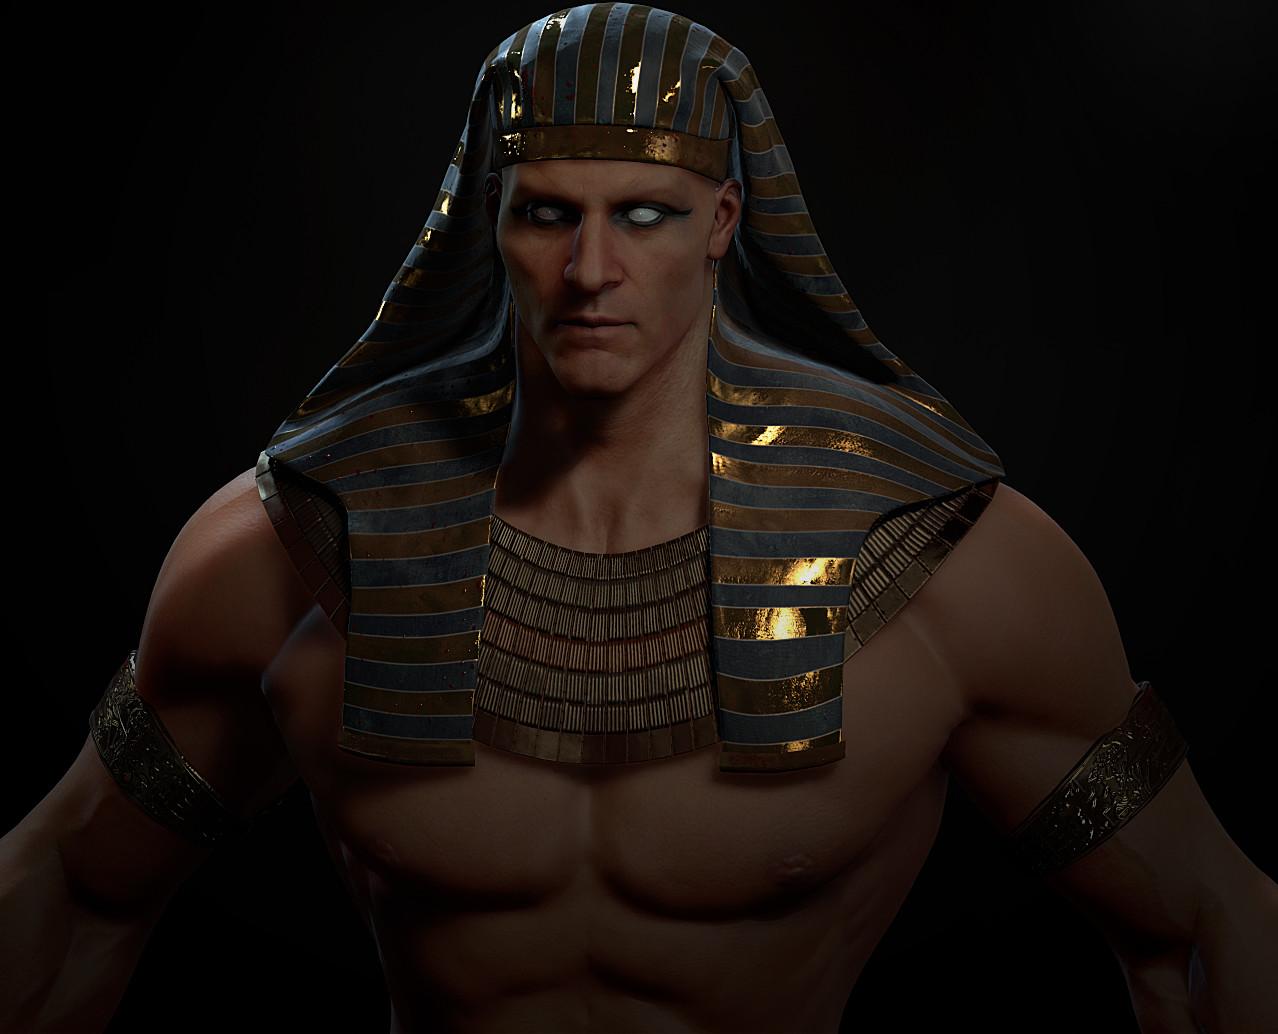 Antone magdy horus 6